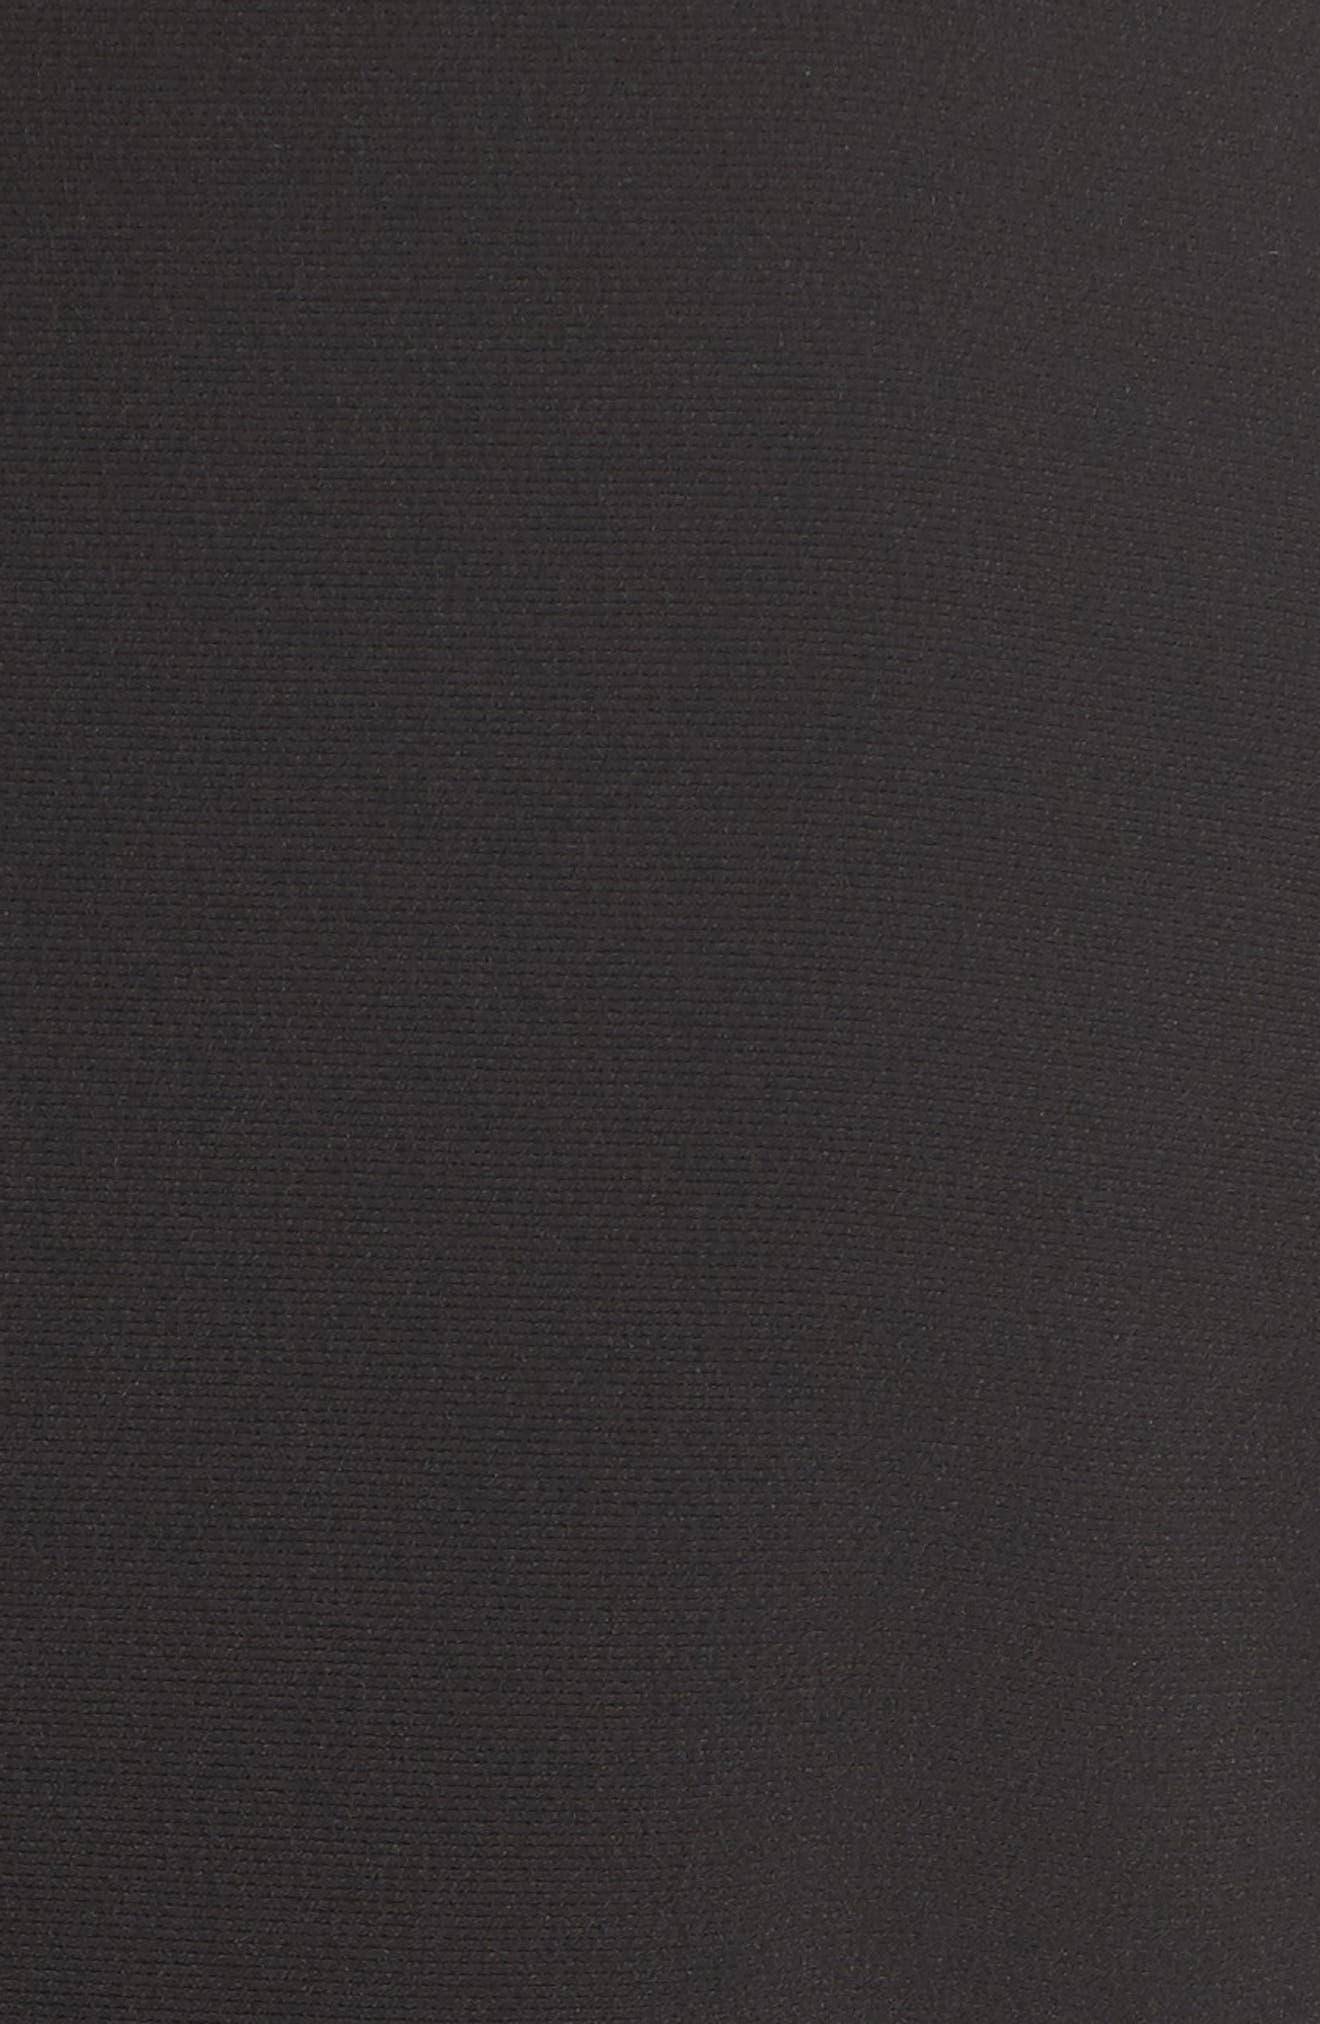 Jisuneri Crop Blazer,                             Alternate thumbnail 6, color,                             001